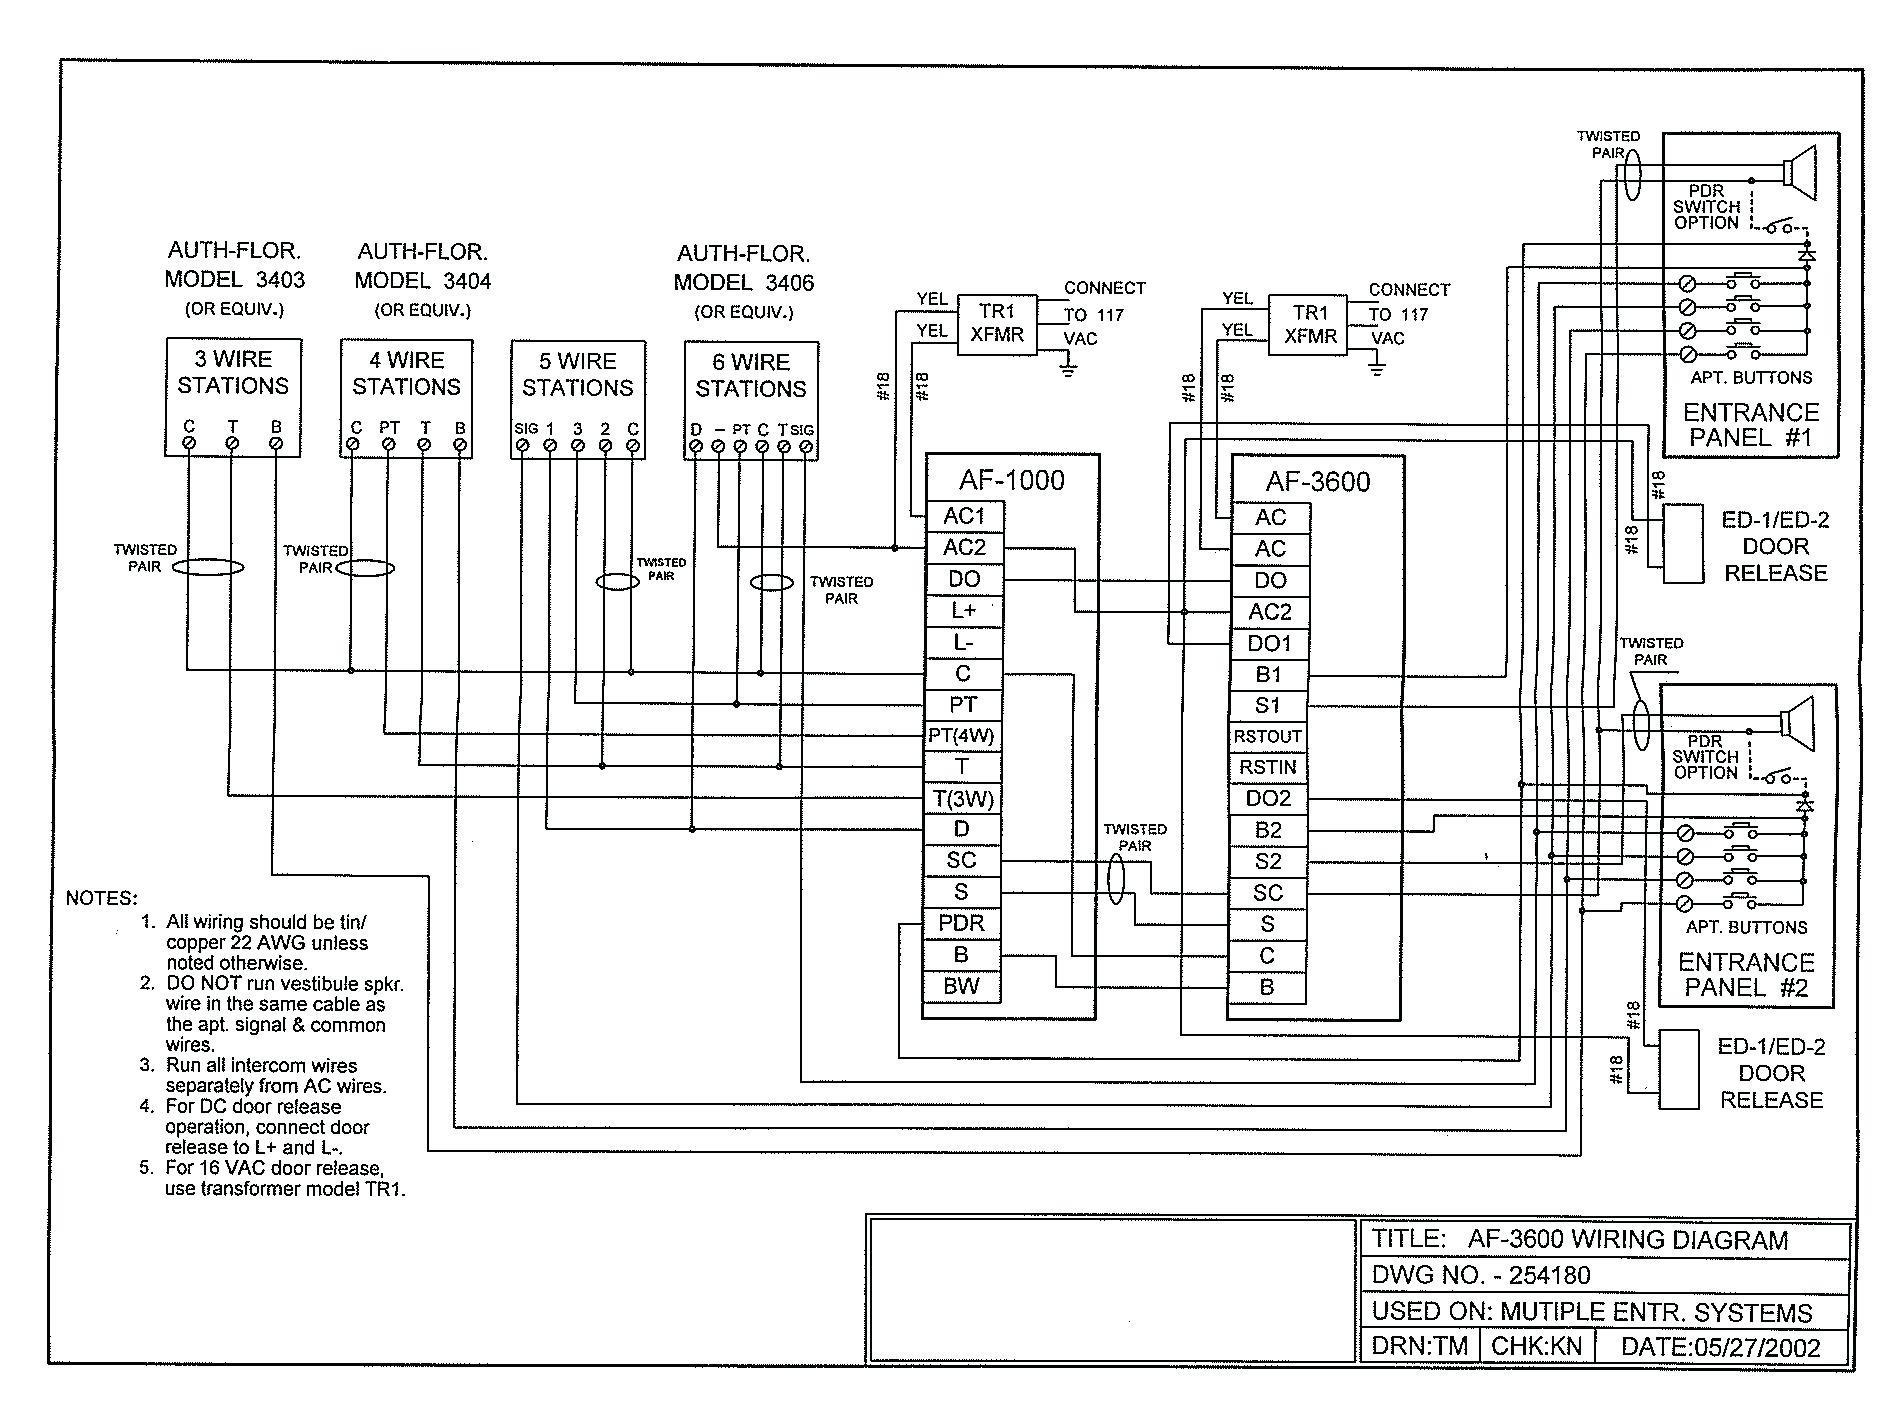 Candlestick Telephone Wiring Diagram : Western electric candlestick phone wiring schematic old